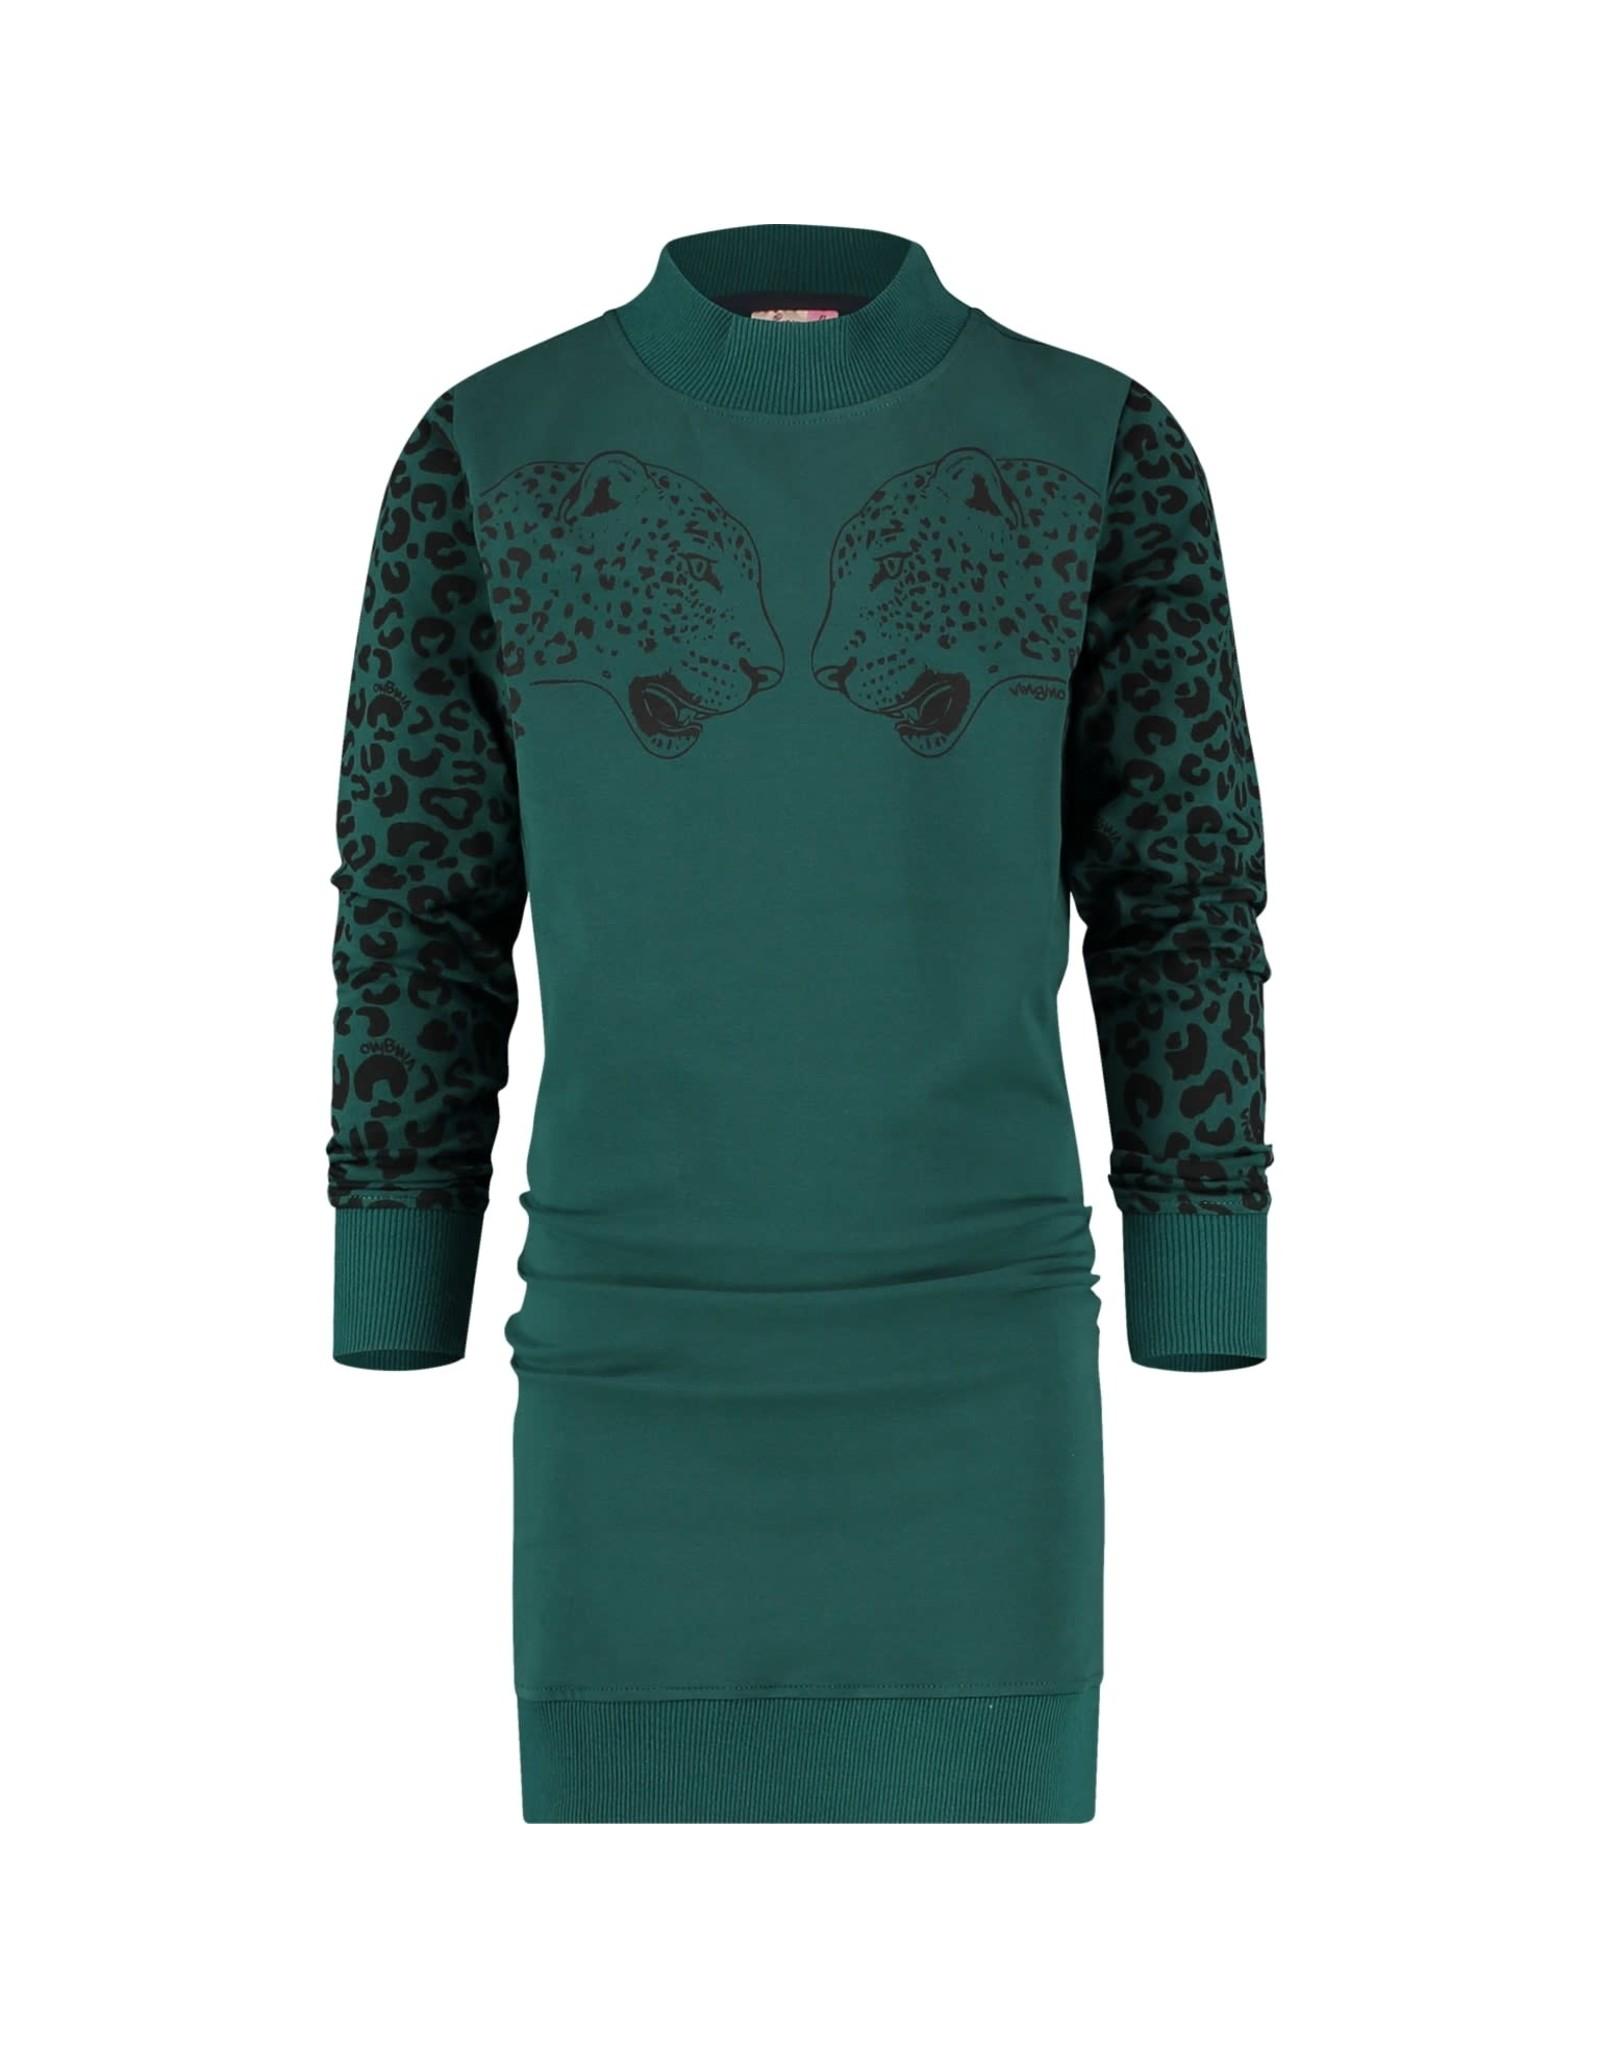 Vingino Vingino meiden jurk Palloes Deep Green